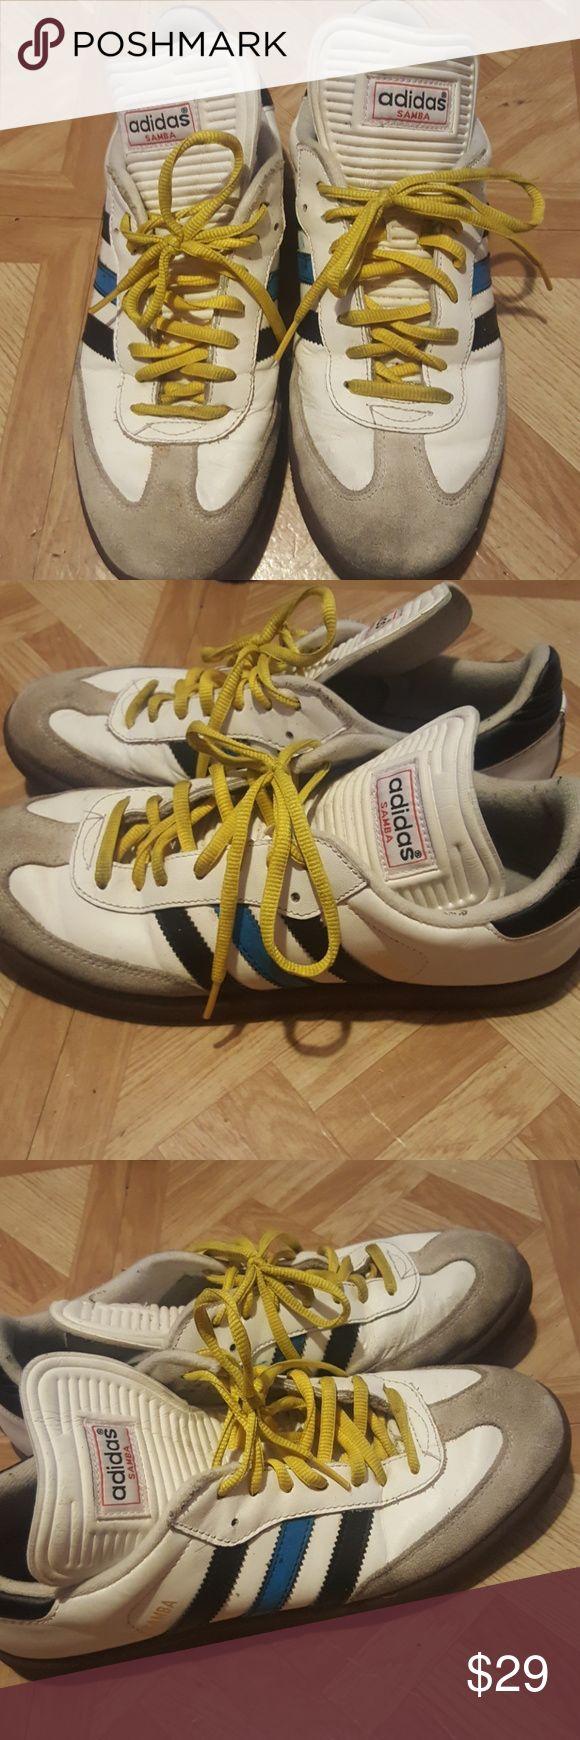 adidas samba nens sz 9 adidas samba indoor shoes in good condition adidas Shoes Sneakers